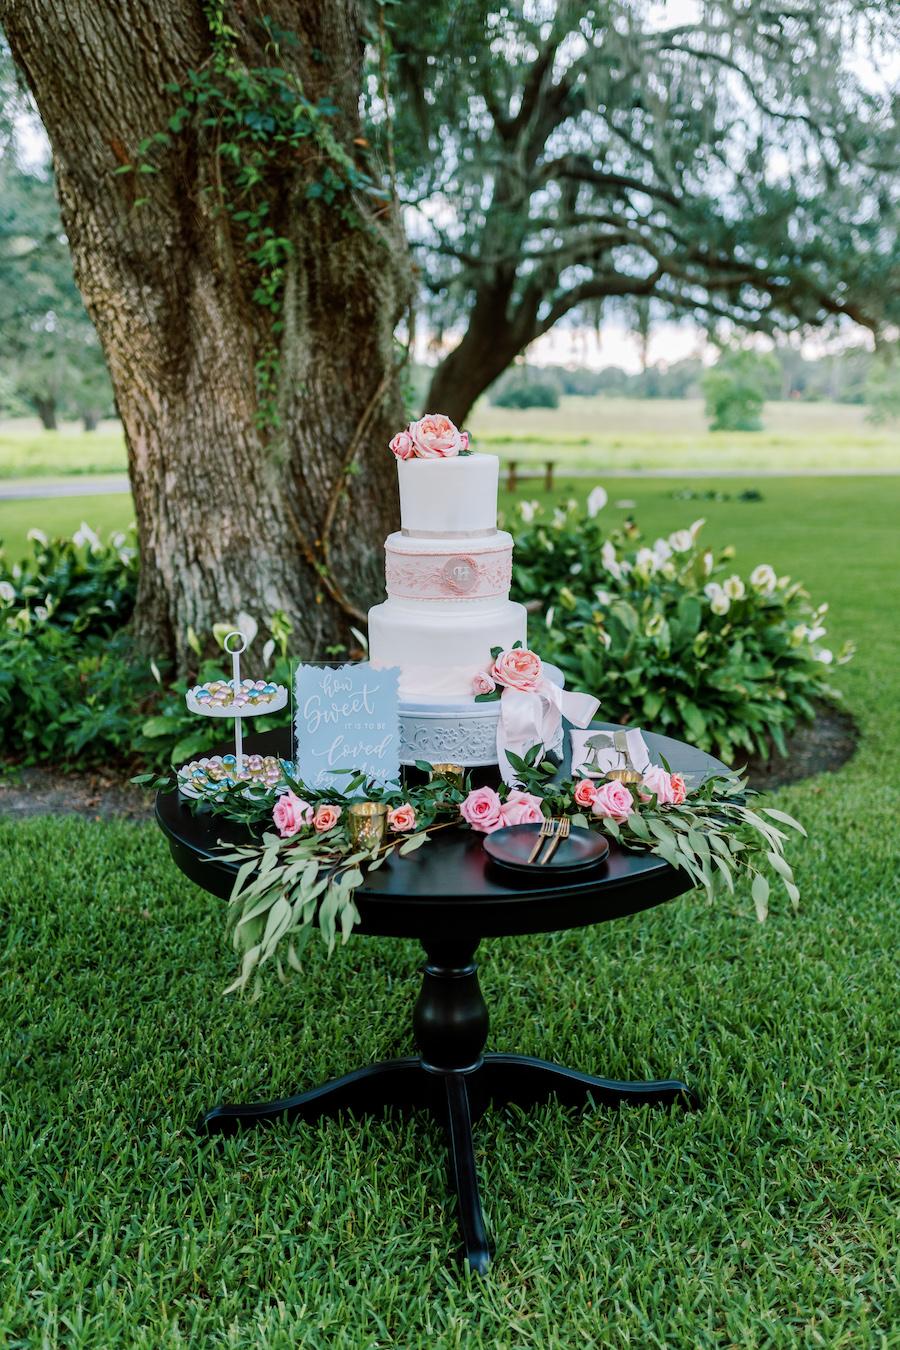 Tampa Bay Wedding Planner EventFull Weddings